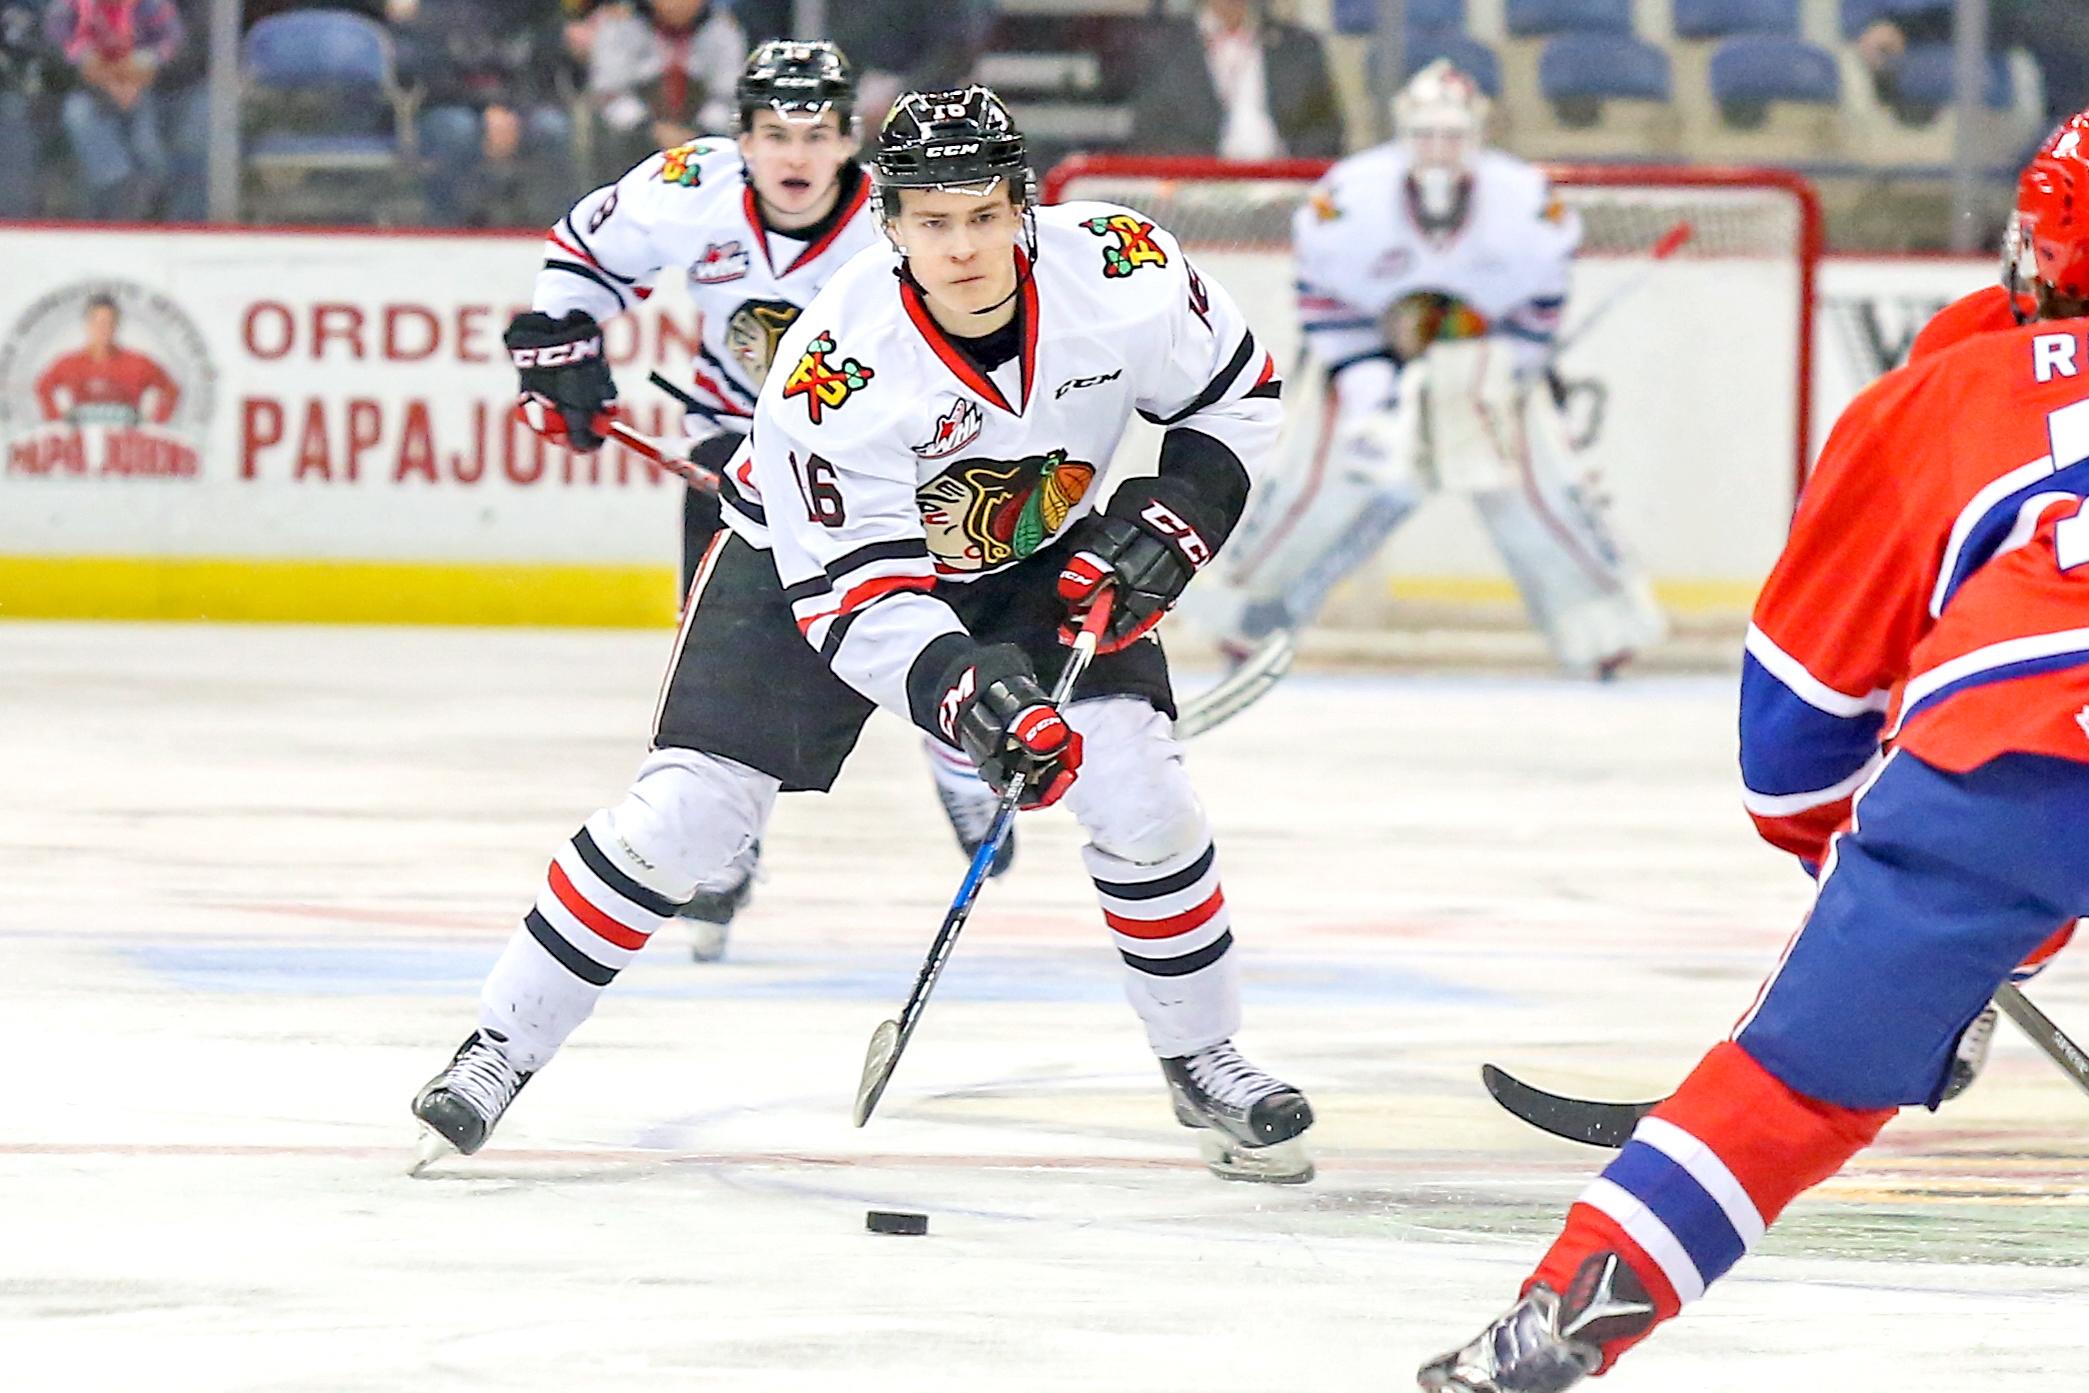 Blackhawks select Henri Jokiharju in Round 1 of the 2017 NHL Draft